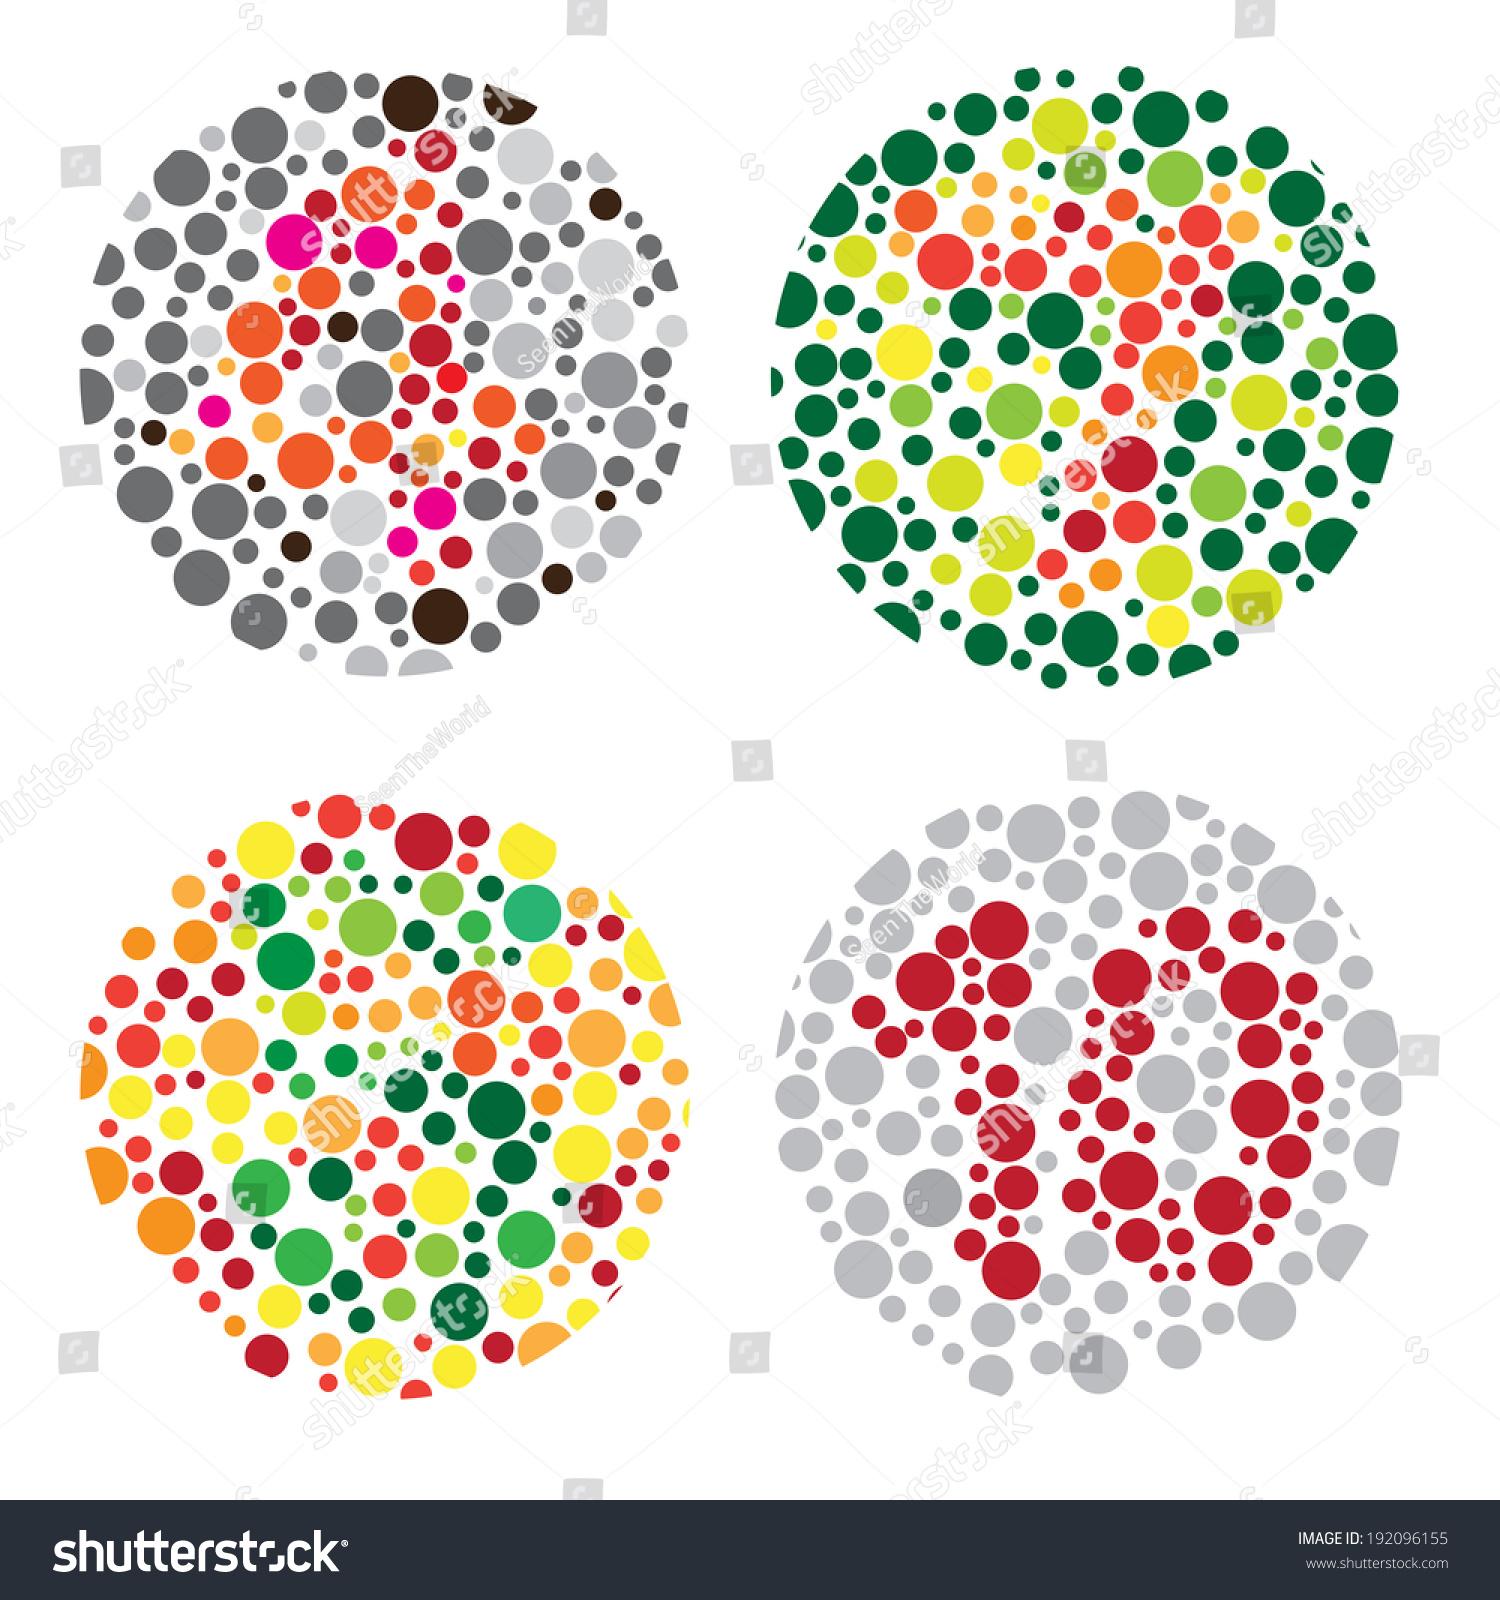 Color Blind Test Daltonismcolor Blindness Disease Stock Vector